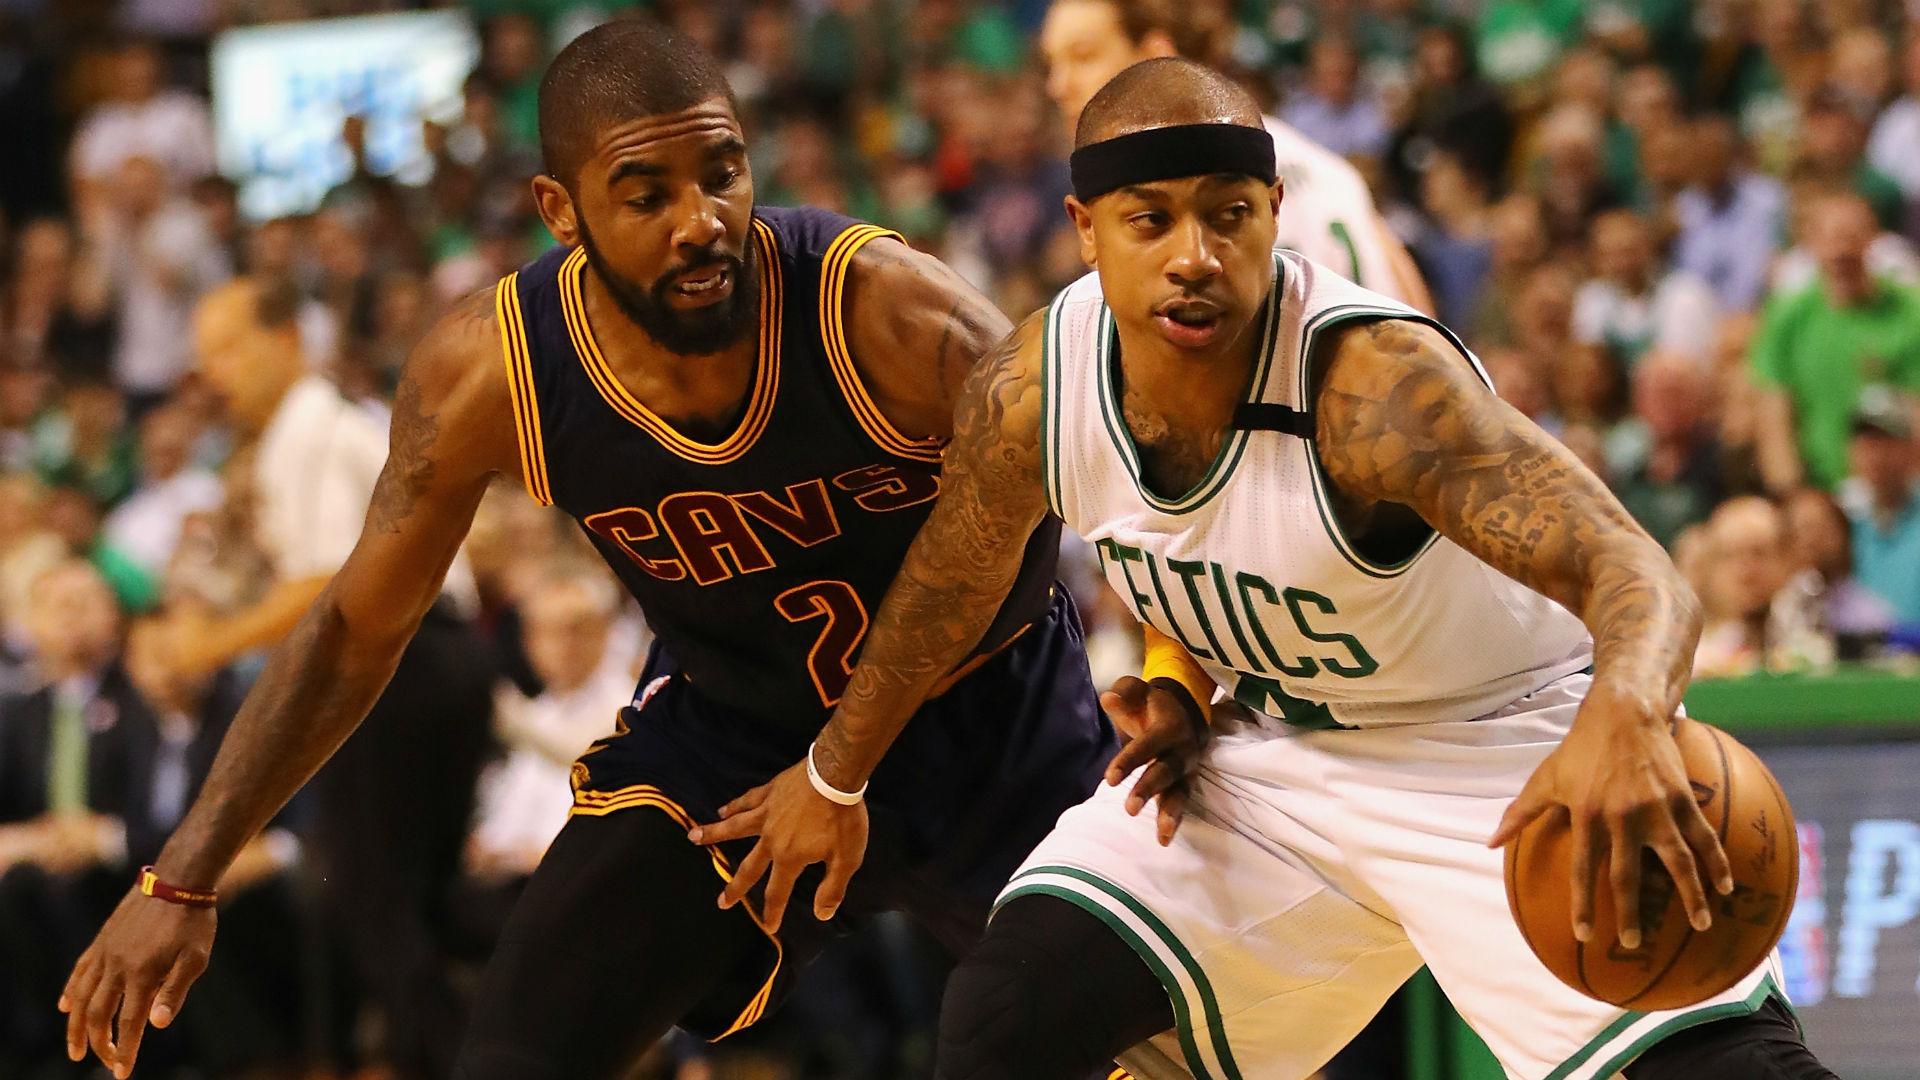 NBA trade rumors: Cavs, Celtics finalize deal involving Kyrie Irving, Isaiah Thomas